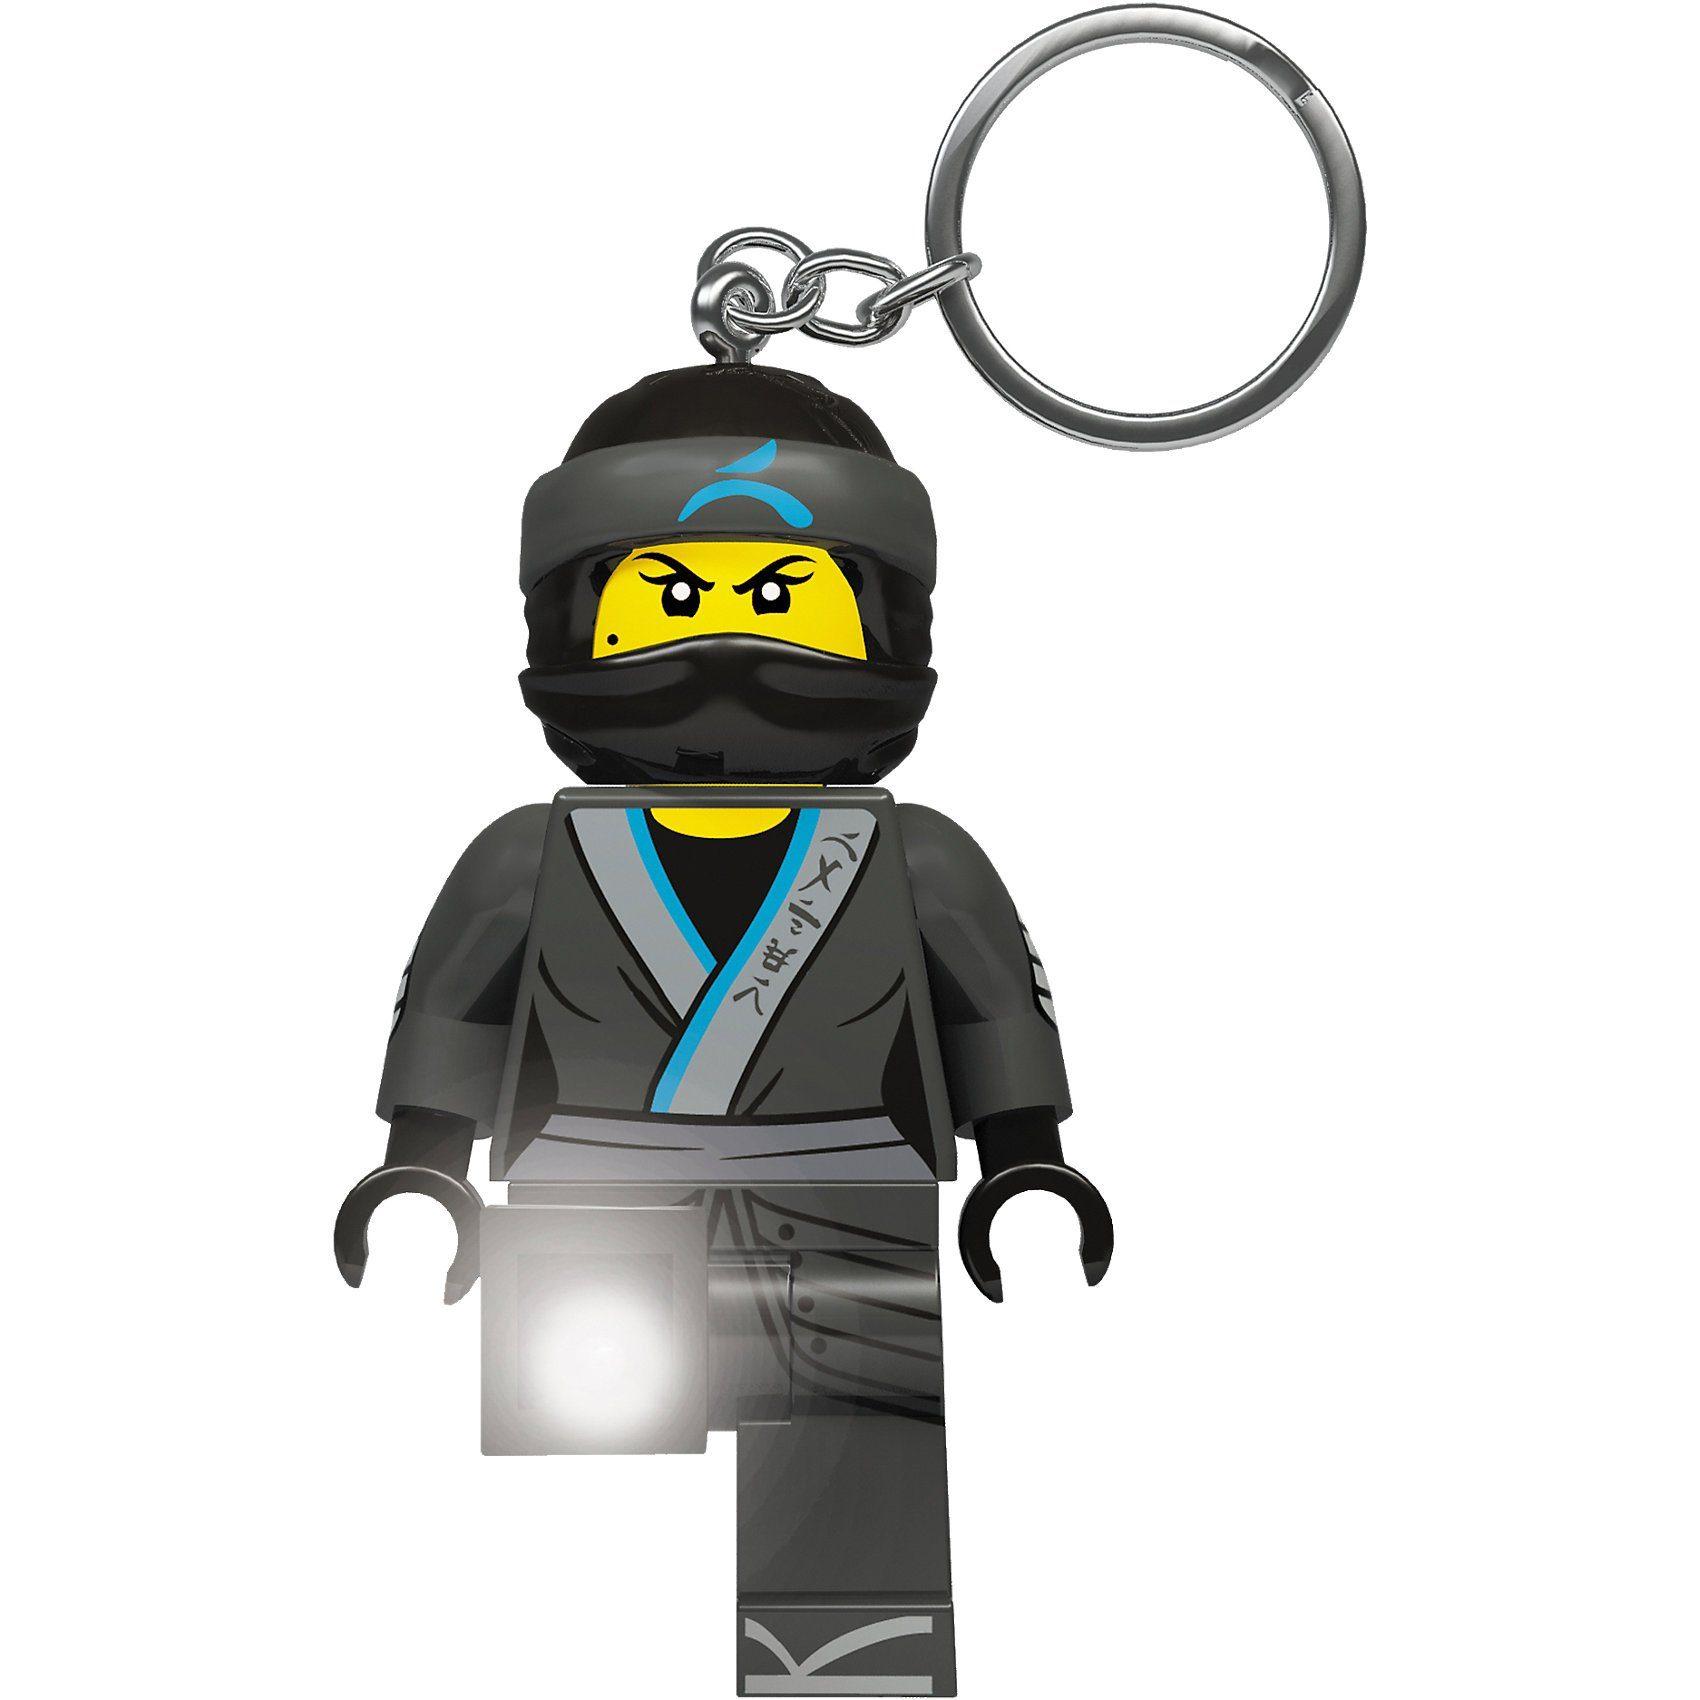 LEGO Ninjago Movie Minitaschenlampe Nya